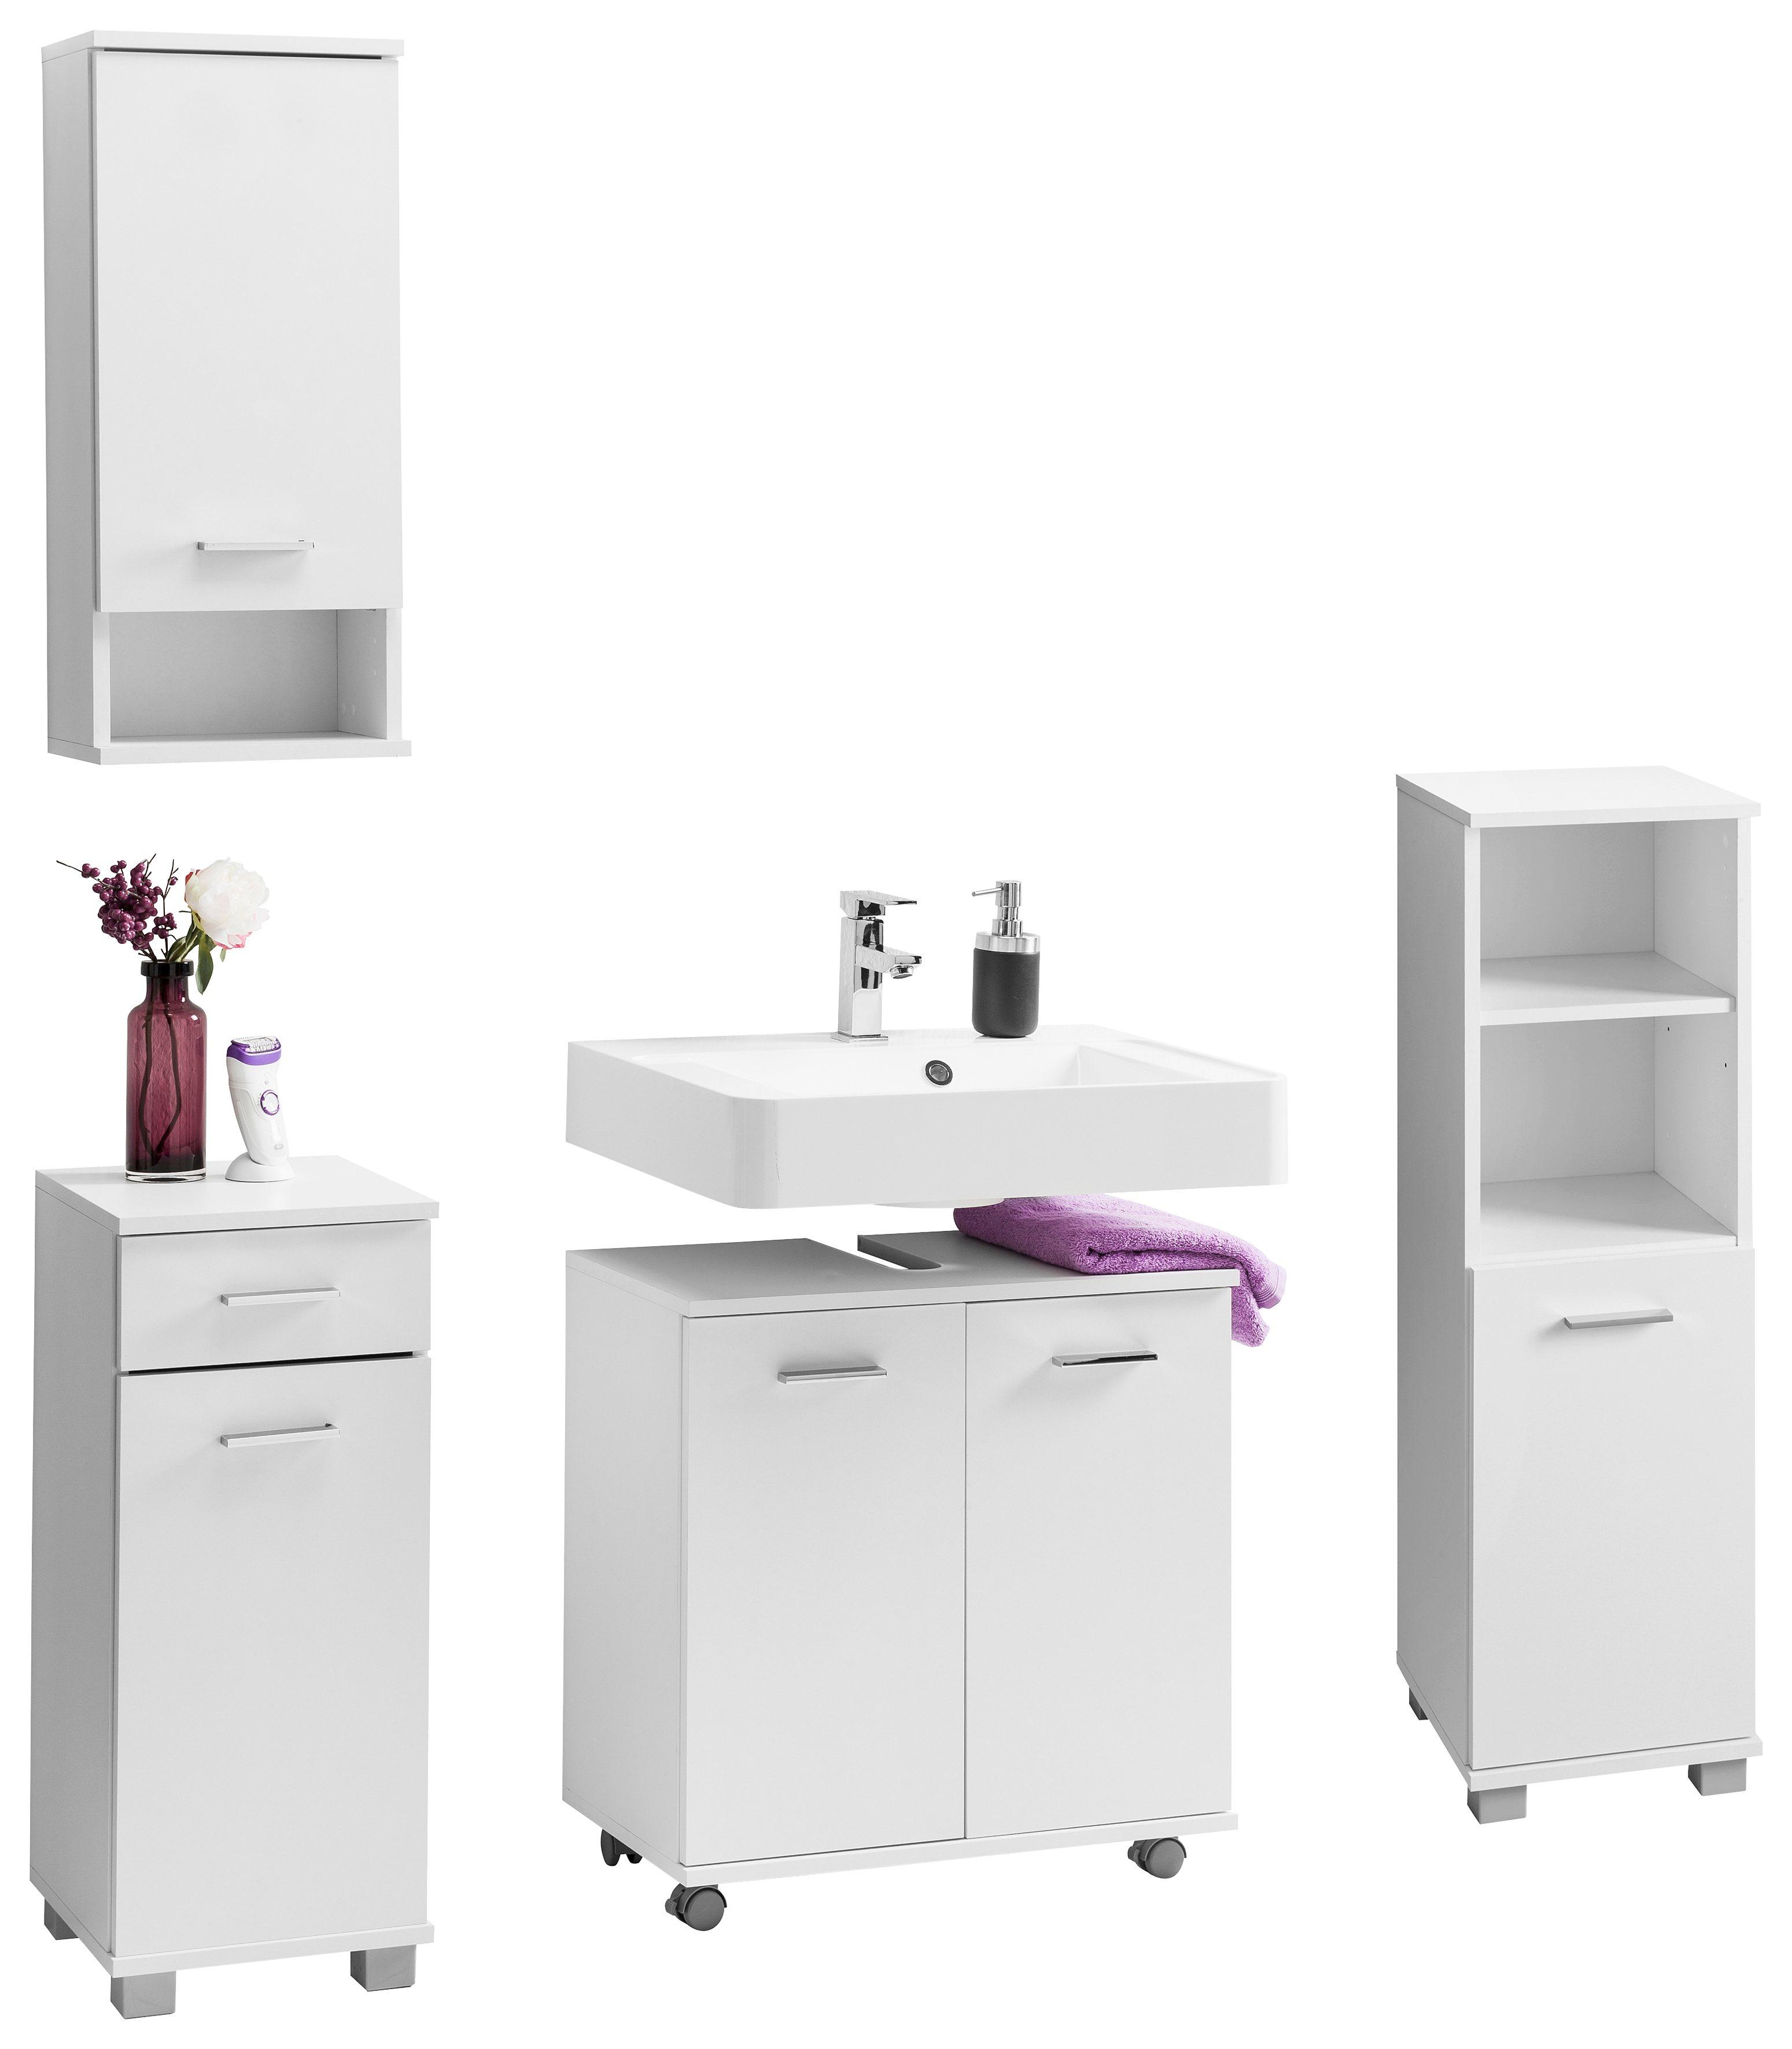 48 sparen badm bel set vigo ab 129 99 cherry m bel otto. Black Bedroom Furniture Sets. Home Design Ideas